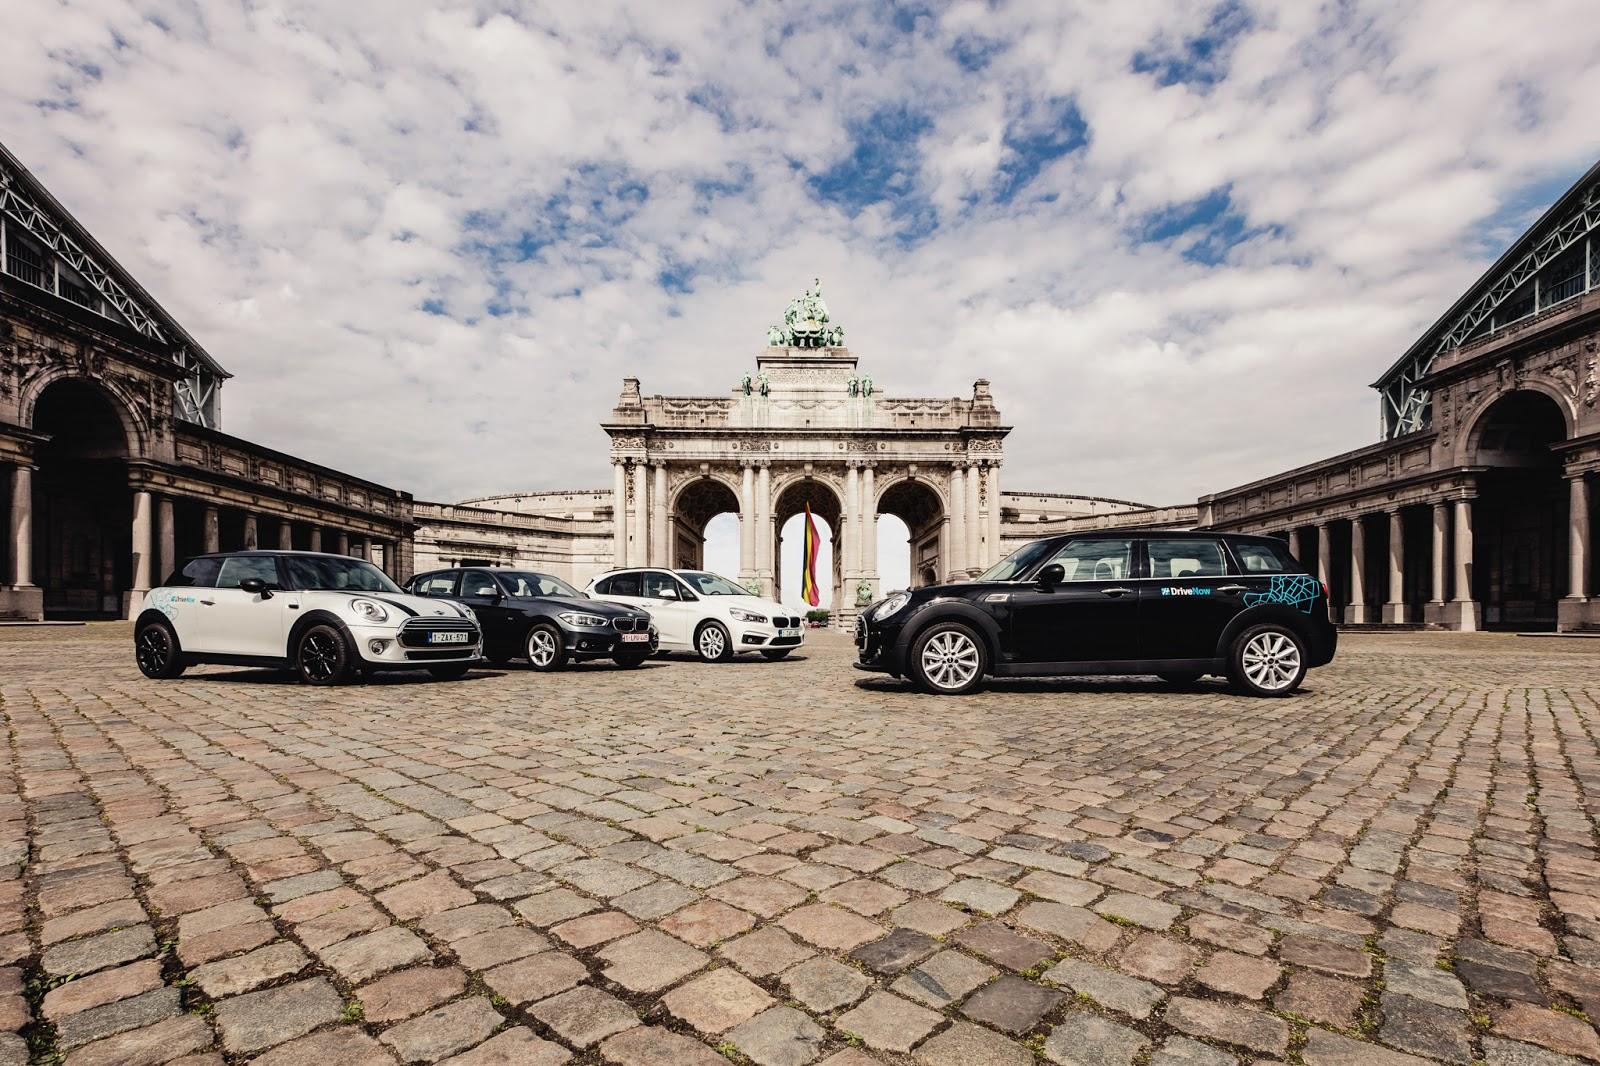 P90225909 highRes drivenow carsharing Οι Βρυξέλες γίνονται η 10η πόλη του προγράμματος κοινοχρησίας οχημάτων BMW, car sharing, Mini